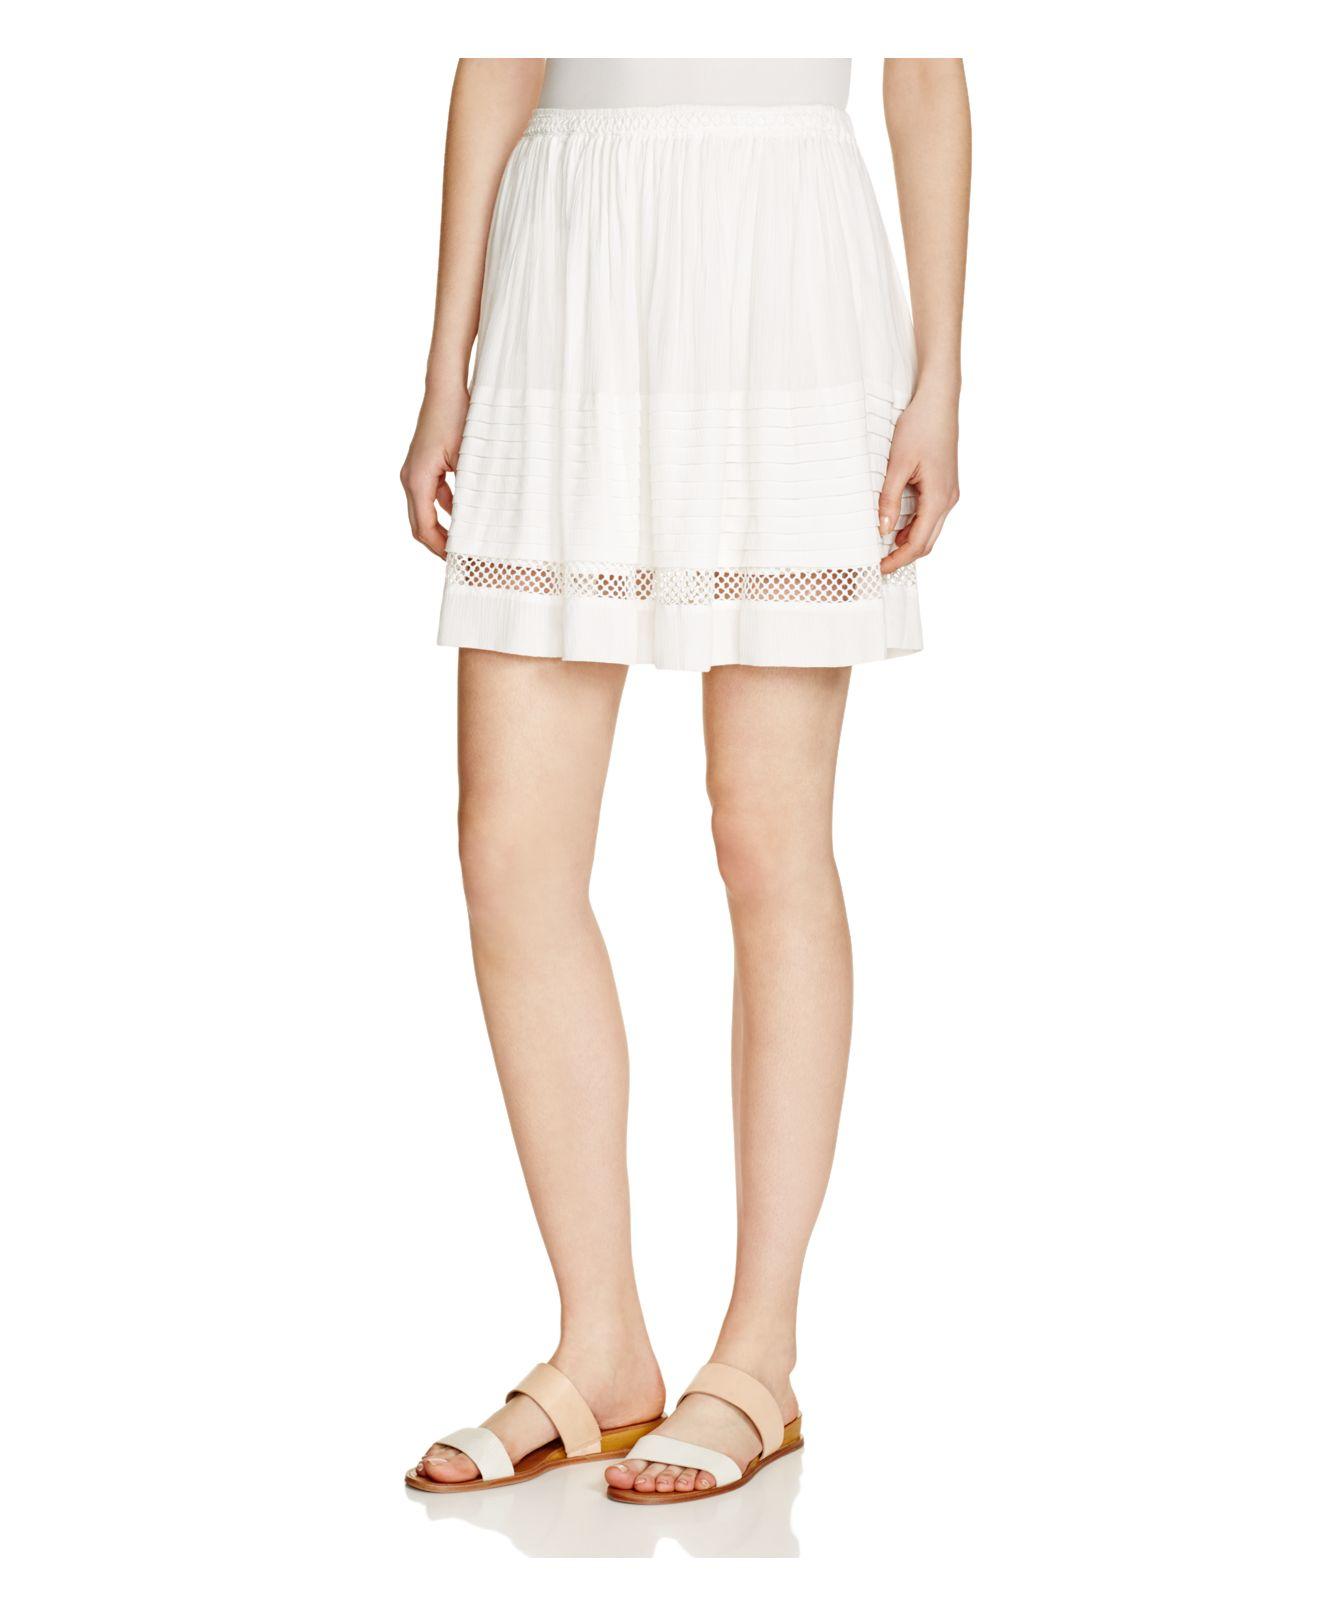 suncoo floris embellished skirt in white blanc casse save 26 lyst. Black Bedroom Furniture Sets. Home Design Ideas